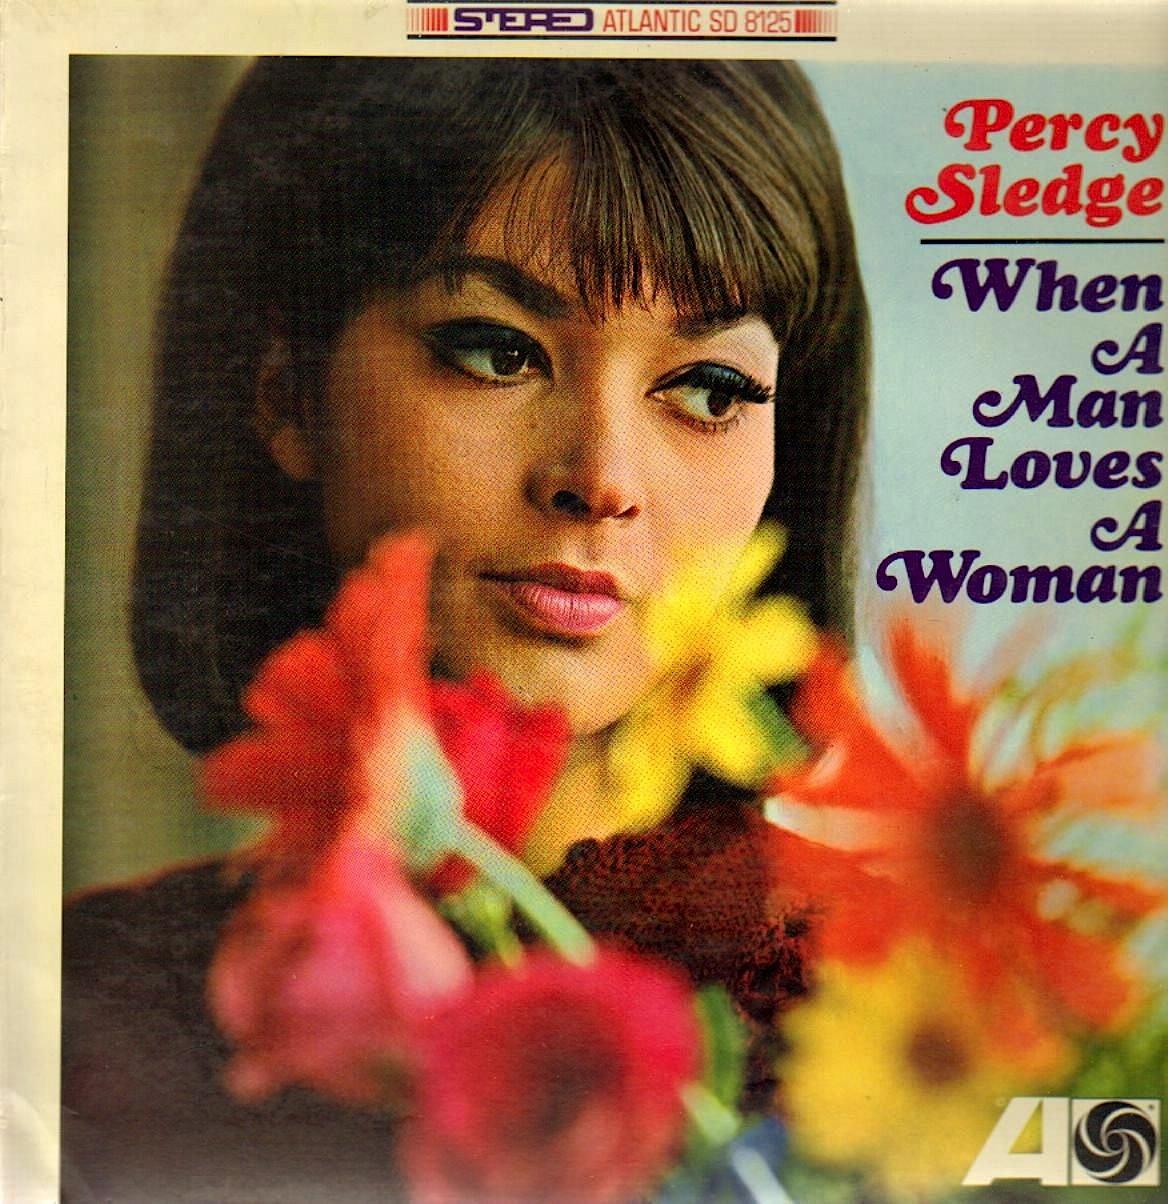 percy_sledge-when_a_man_loves_a_woman_copertina